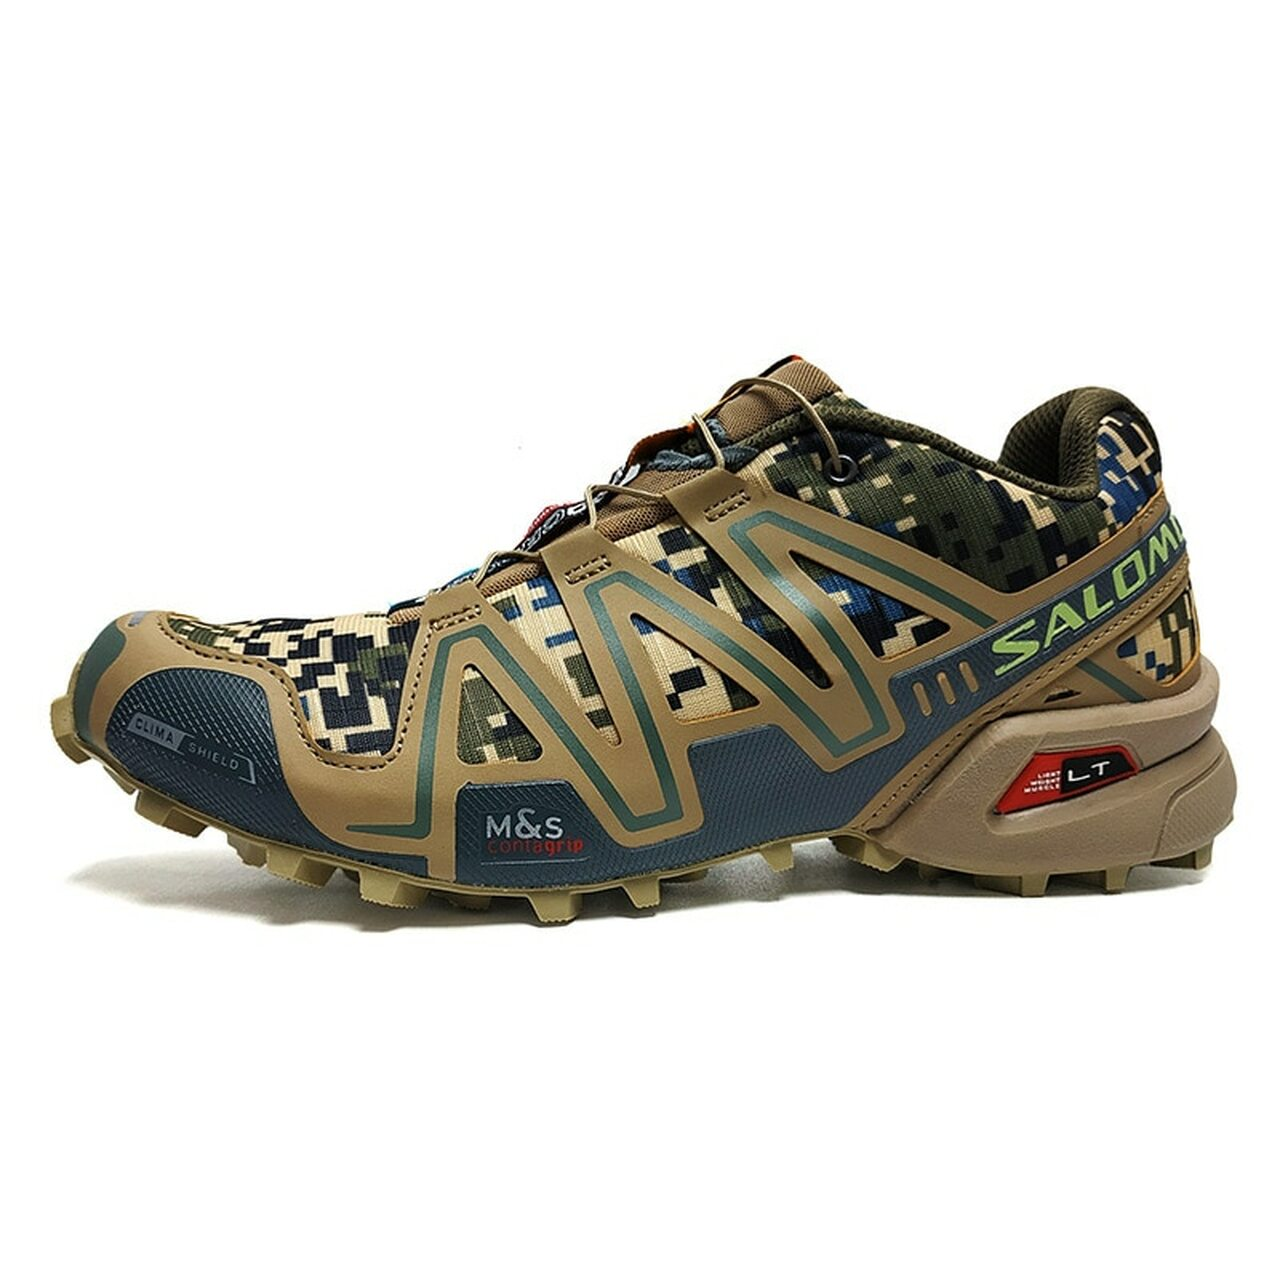 Country Cross Camo Sneakers Salomon Men Shoes Speed 3 Cs 8nmNv0wO